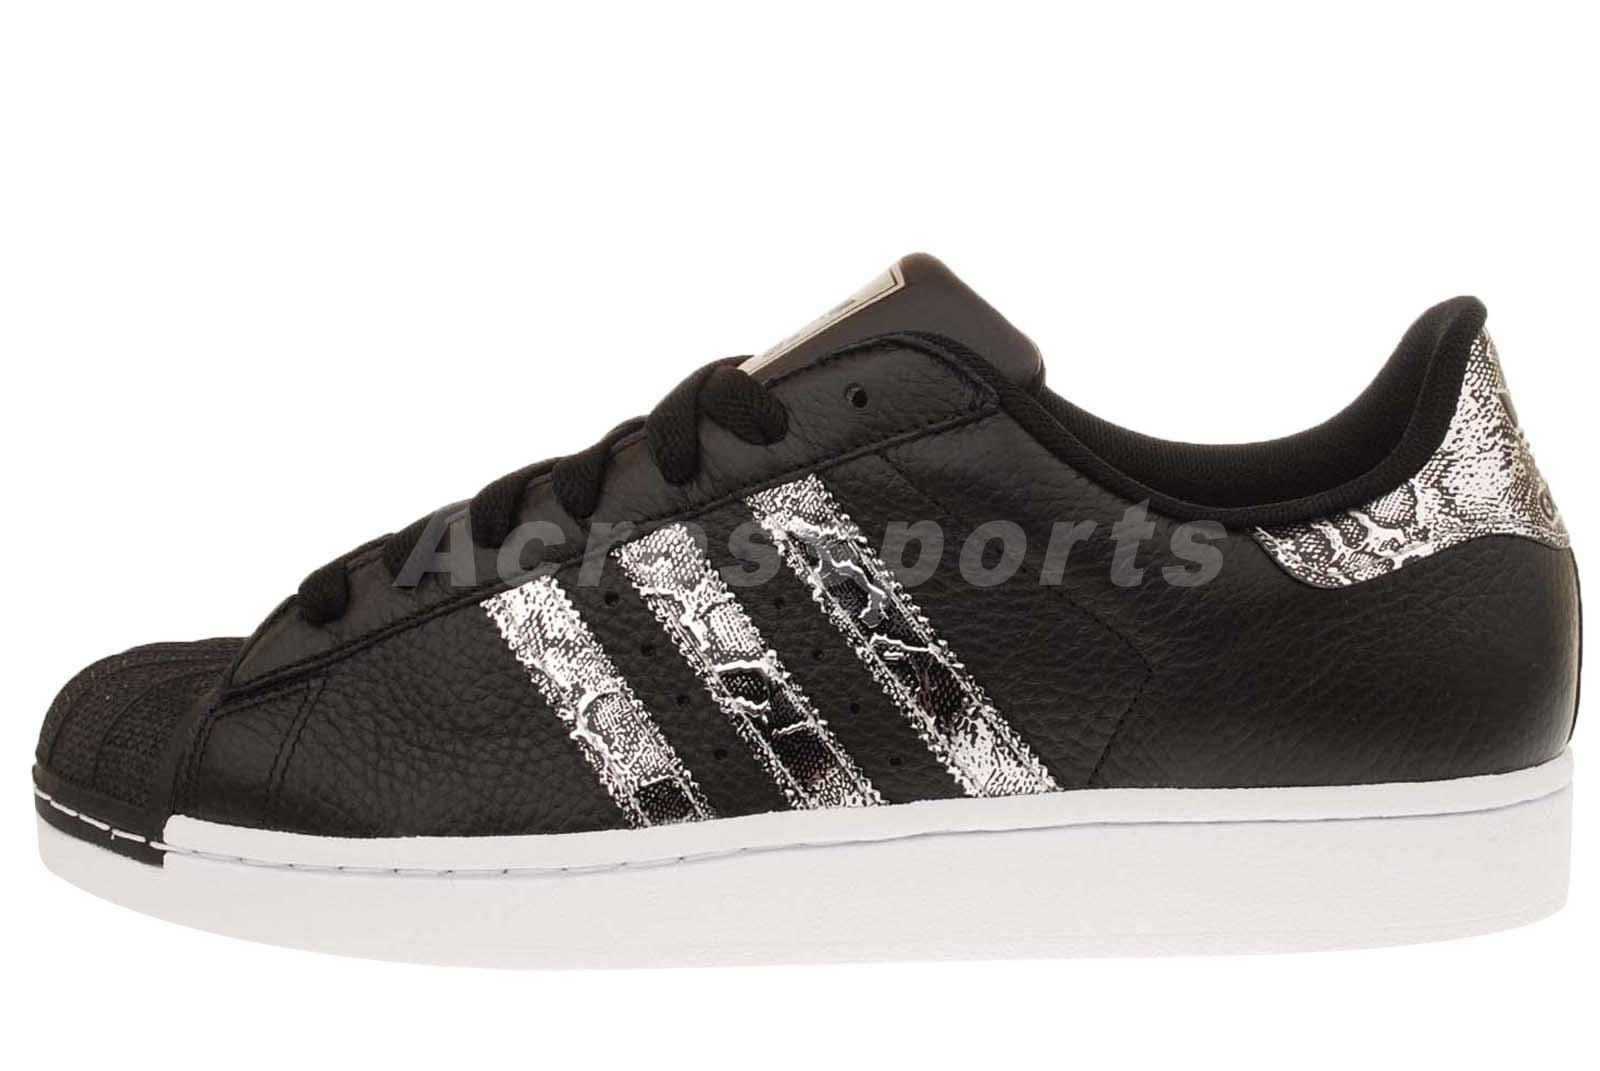 Adidas Bling Shoes Bedazzled Adidas  e8b8066e547e